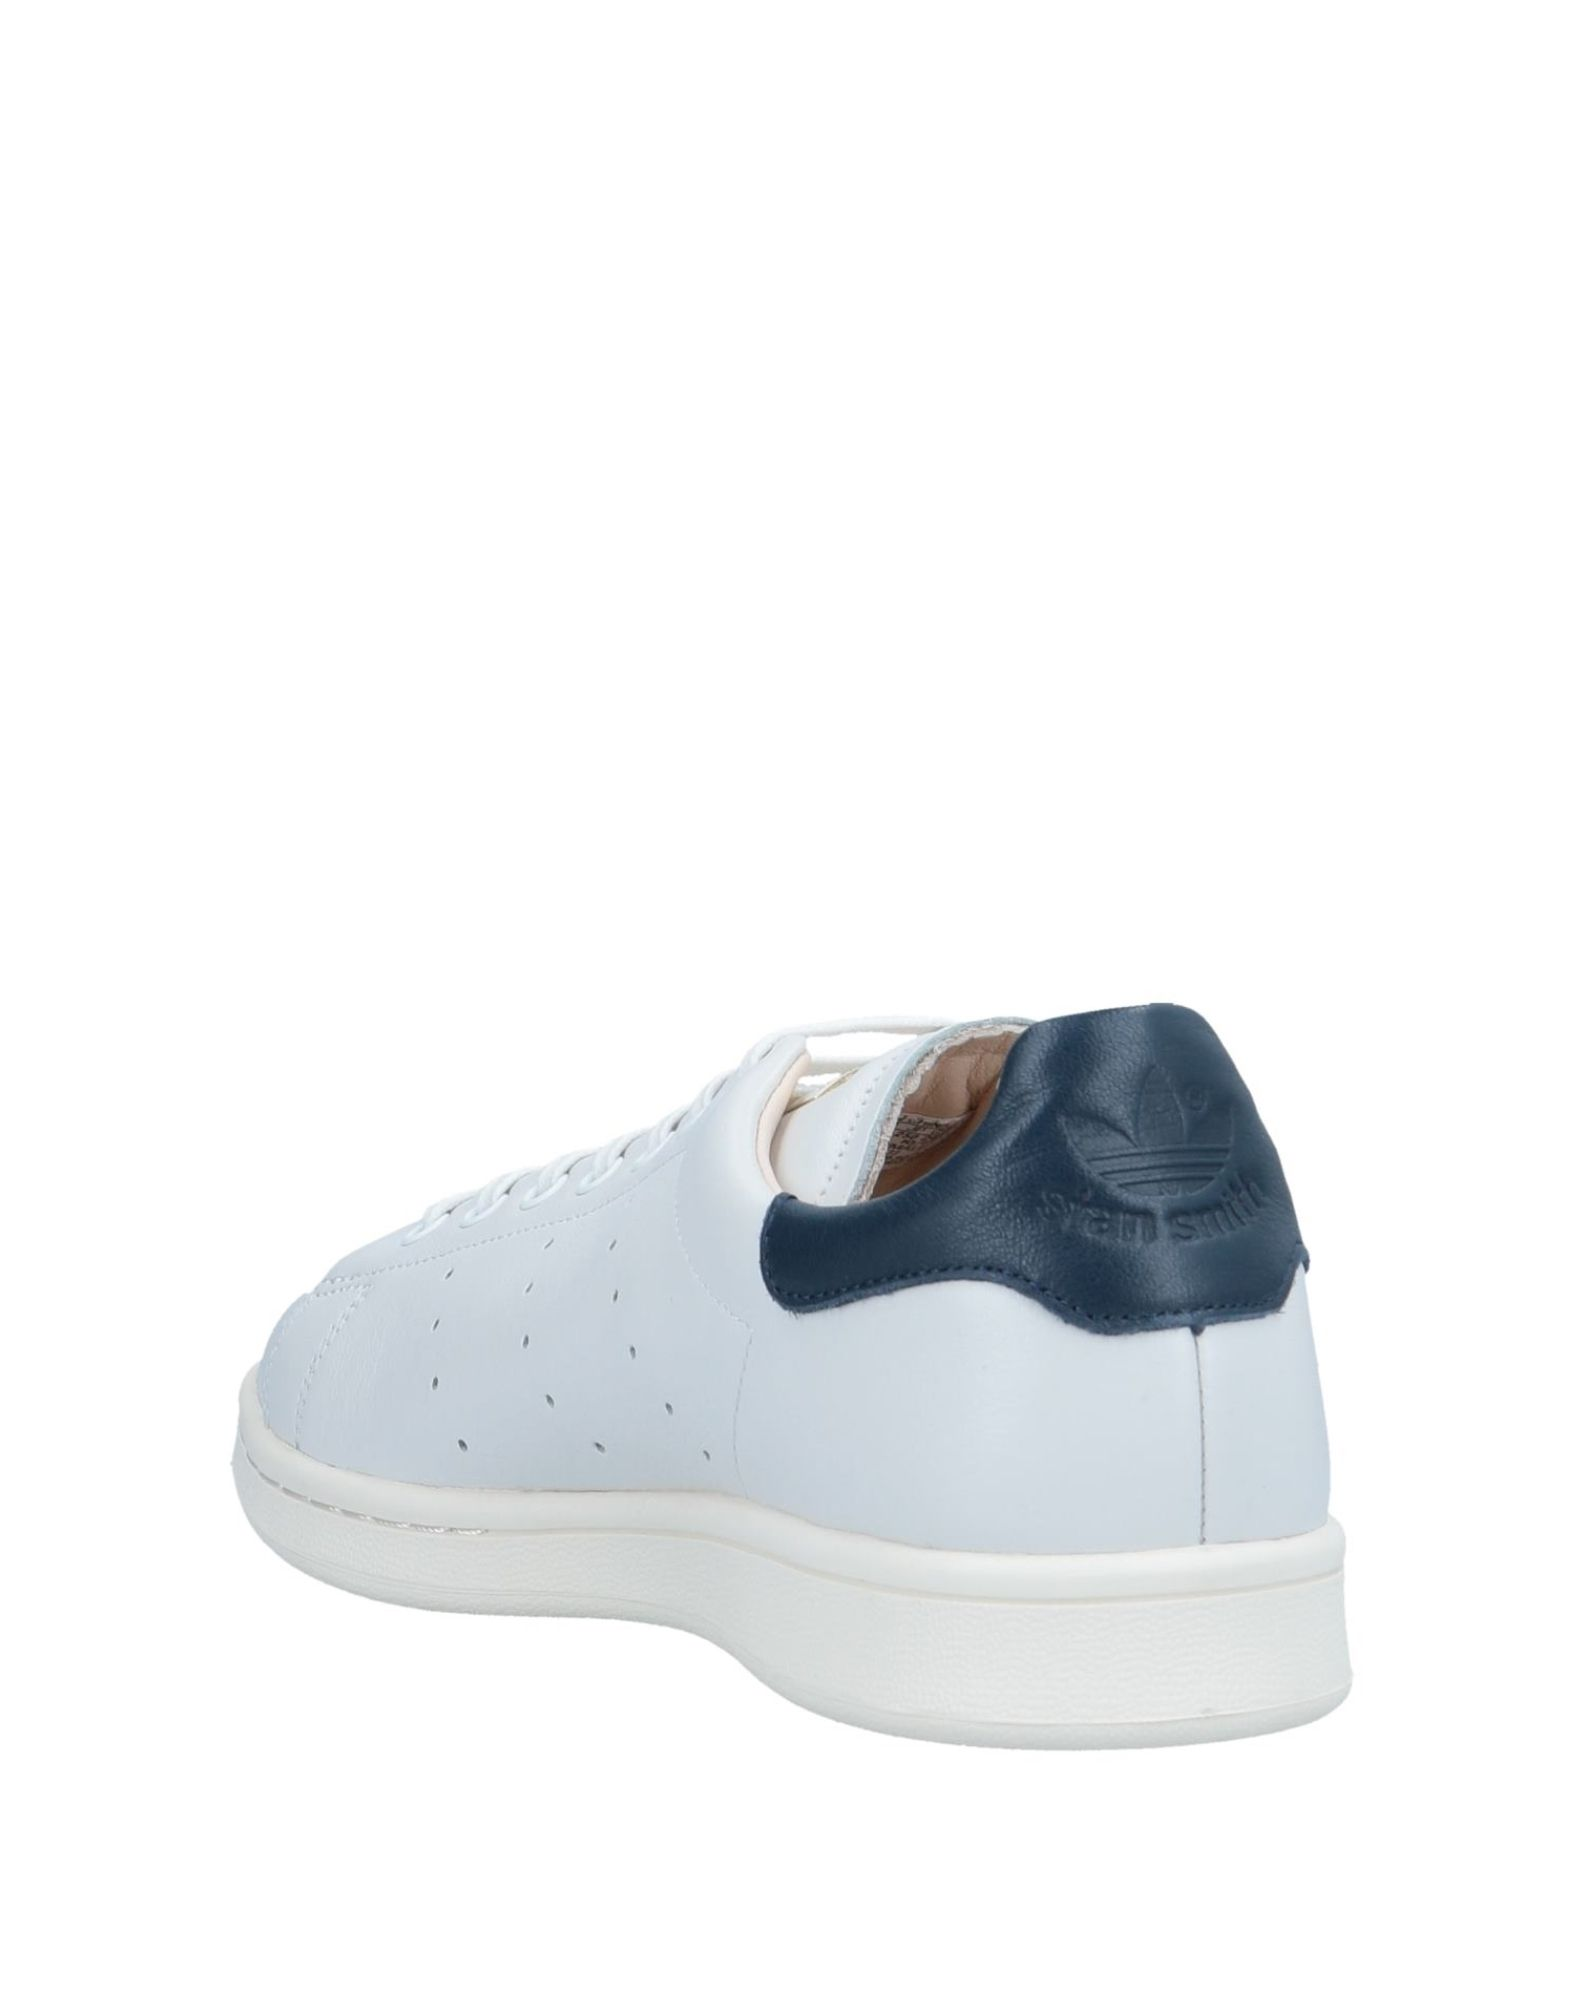 Adidas Adidas Adidas Sneakers - Men Adidas Sneakers online on  Australia - 11583973PR f12ac9